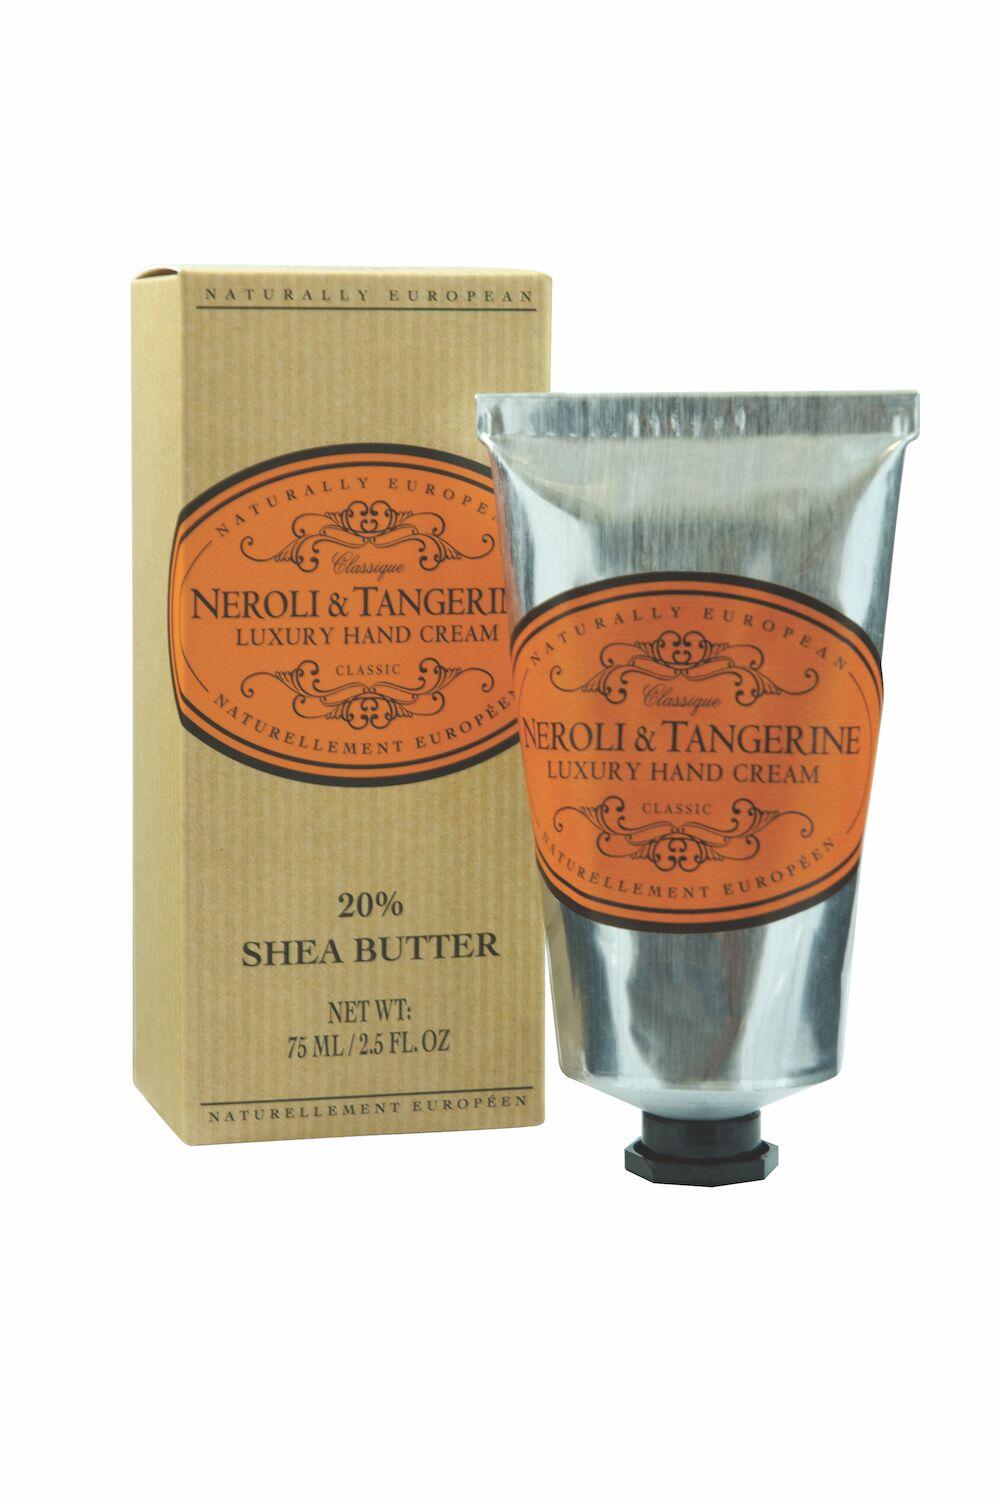 Neuroli/Tangerin Hand Cream 75ml